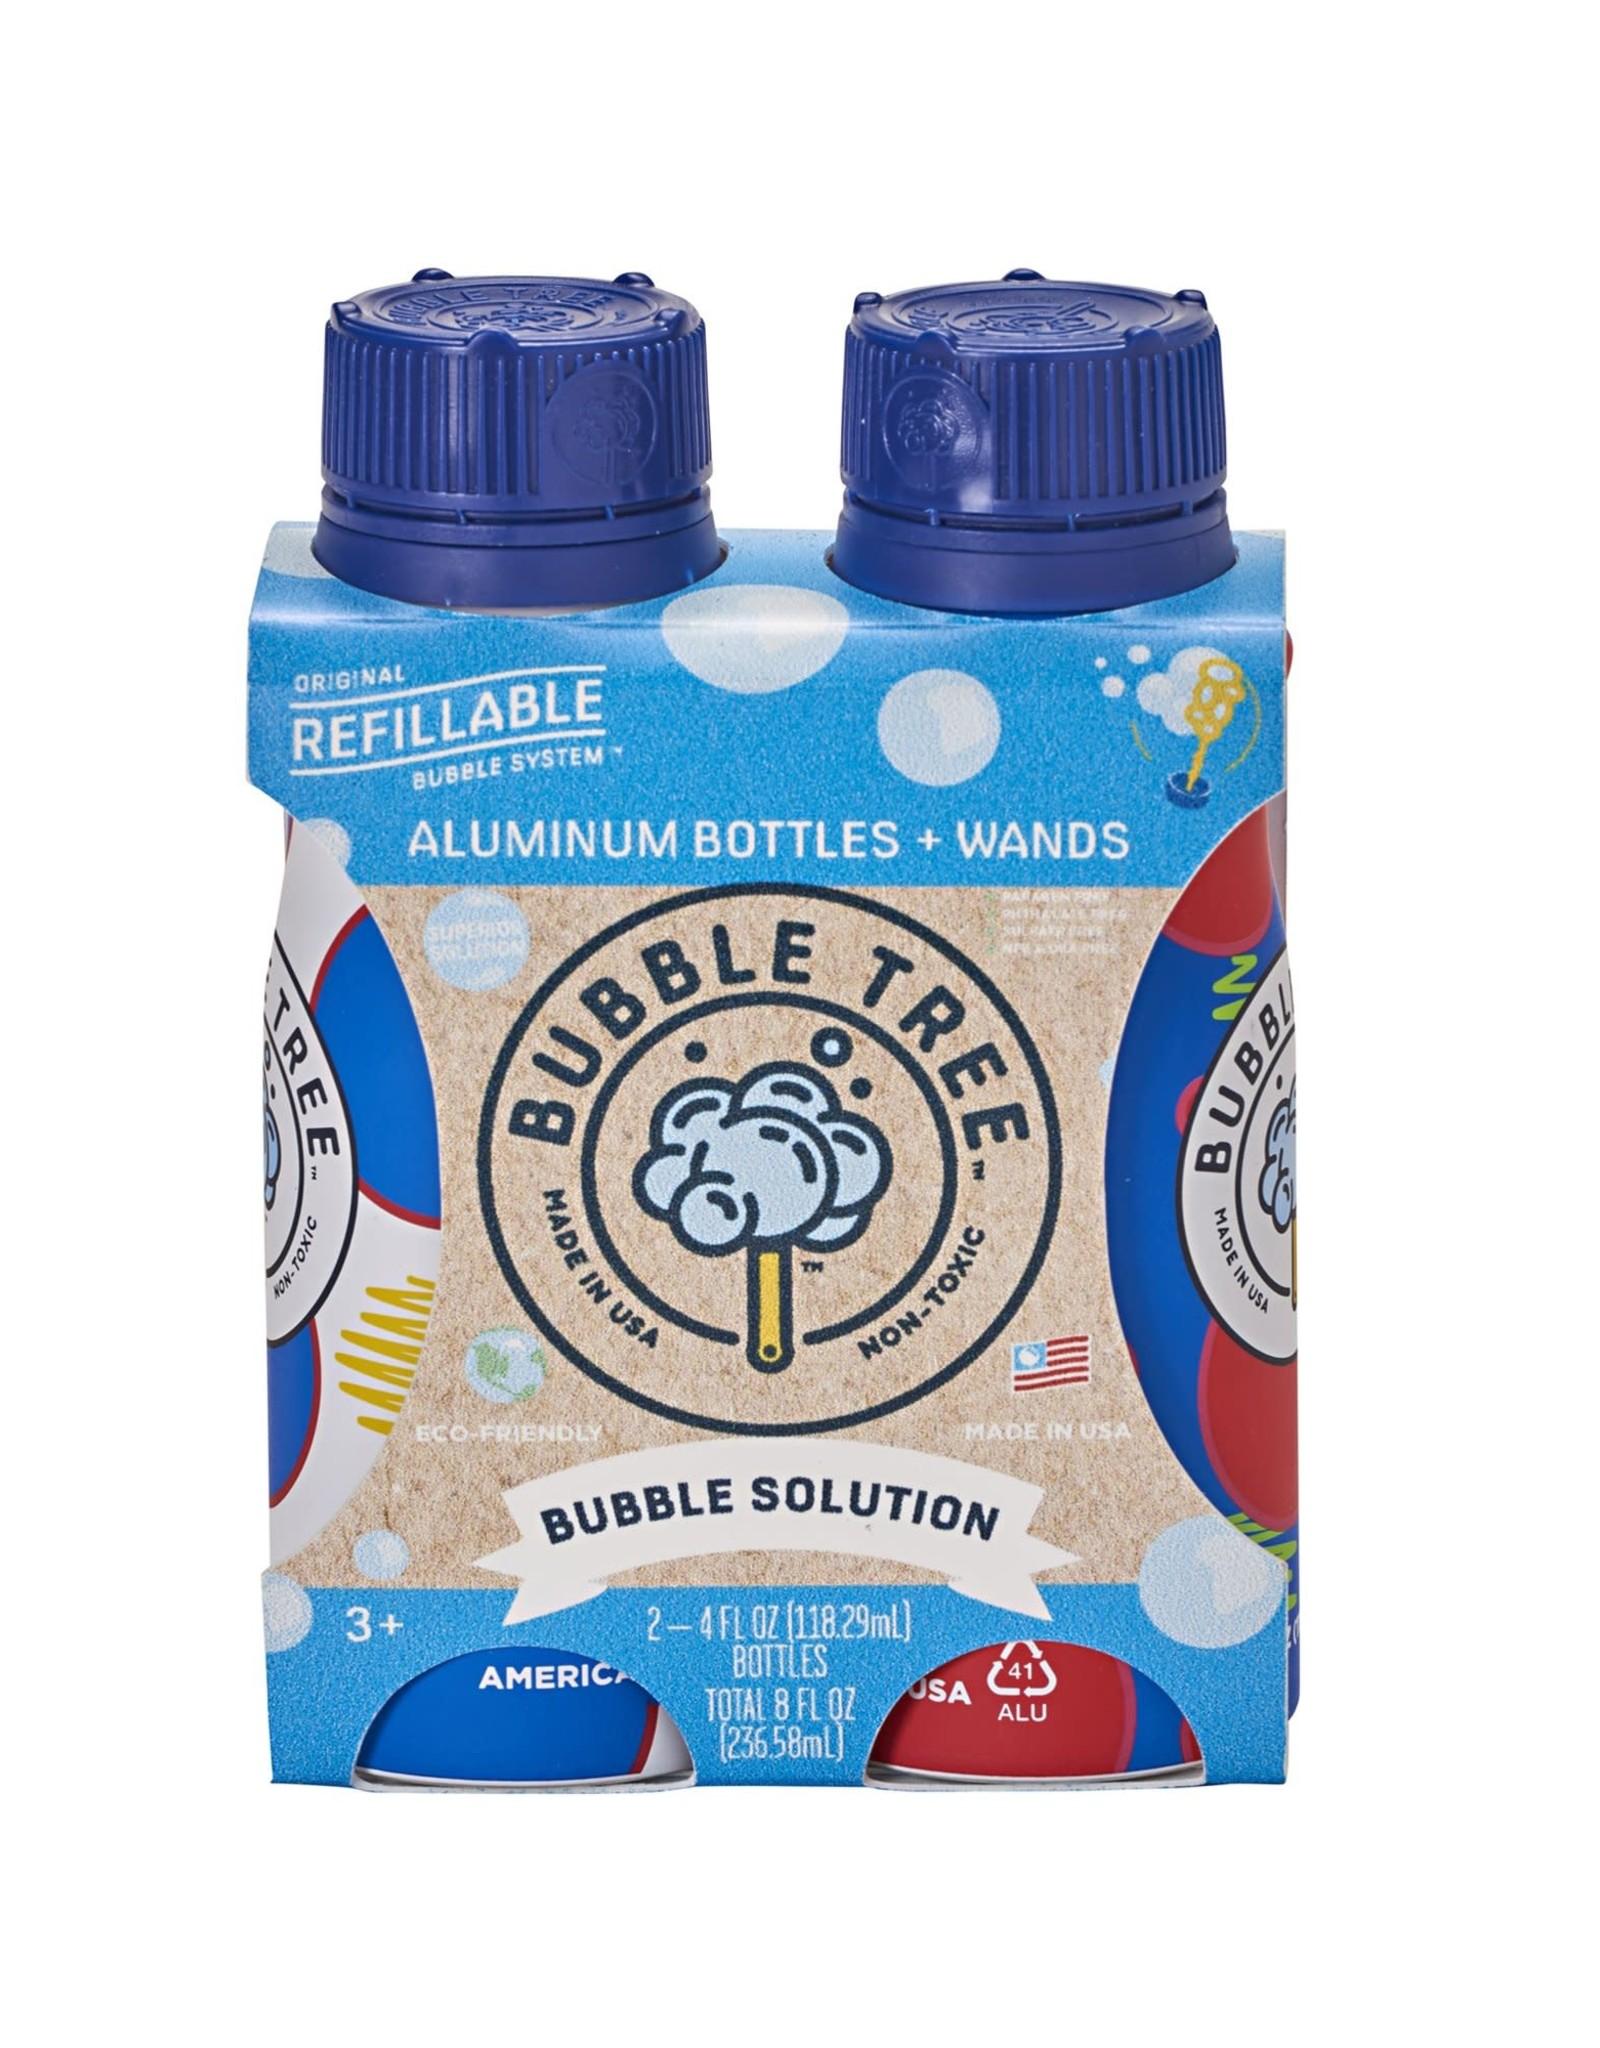 Bubble Tree 2-Pack Original Refillable Bubble System